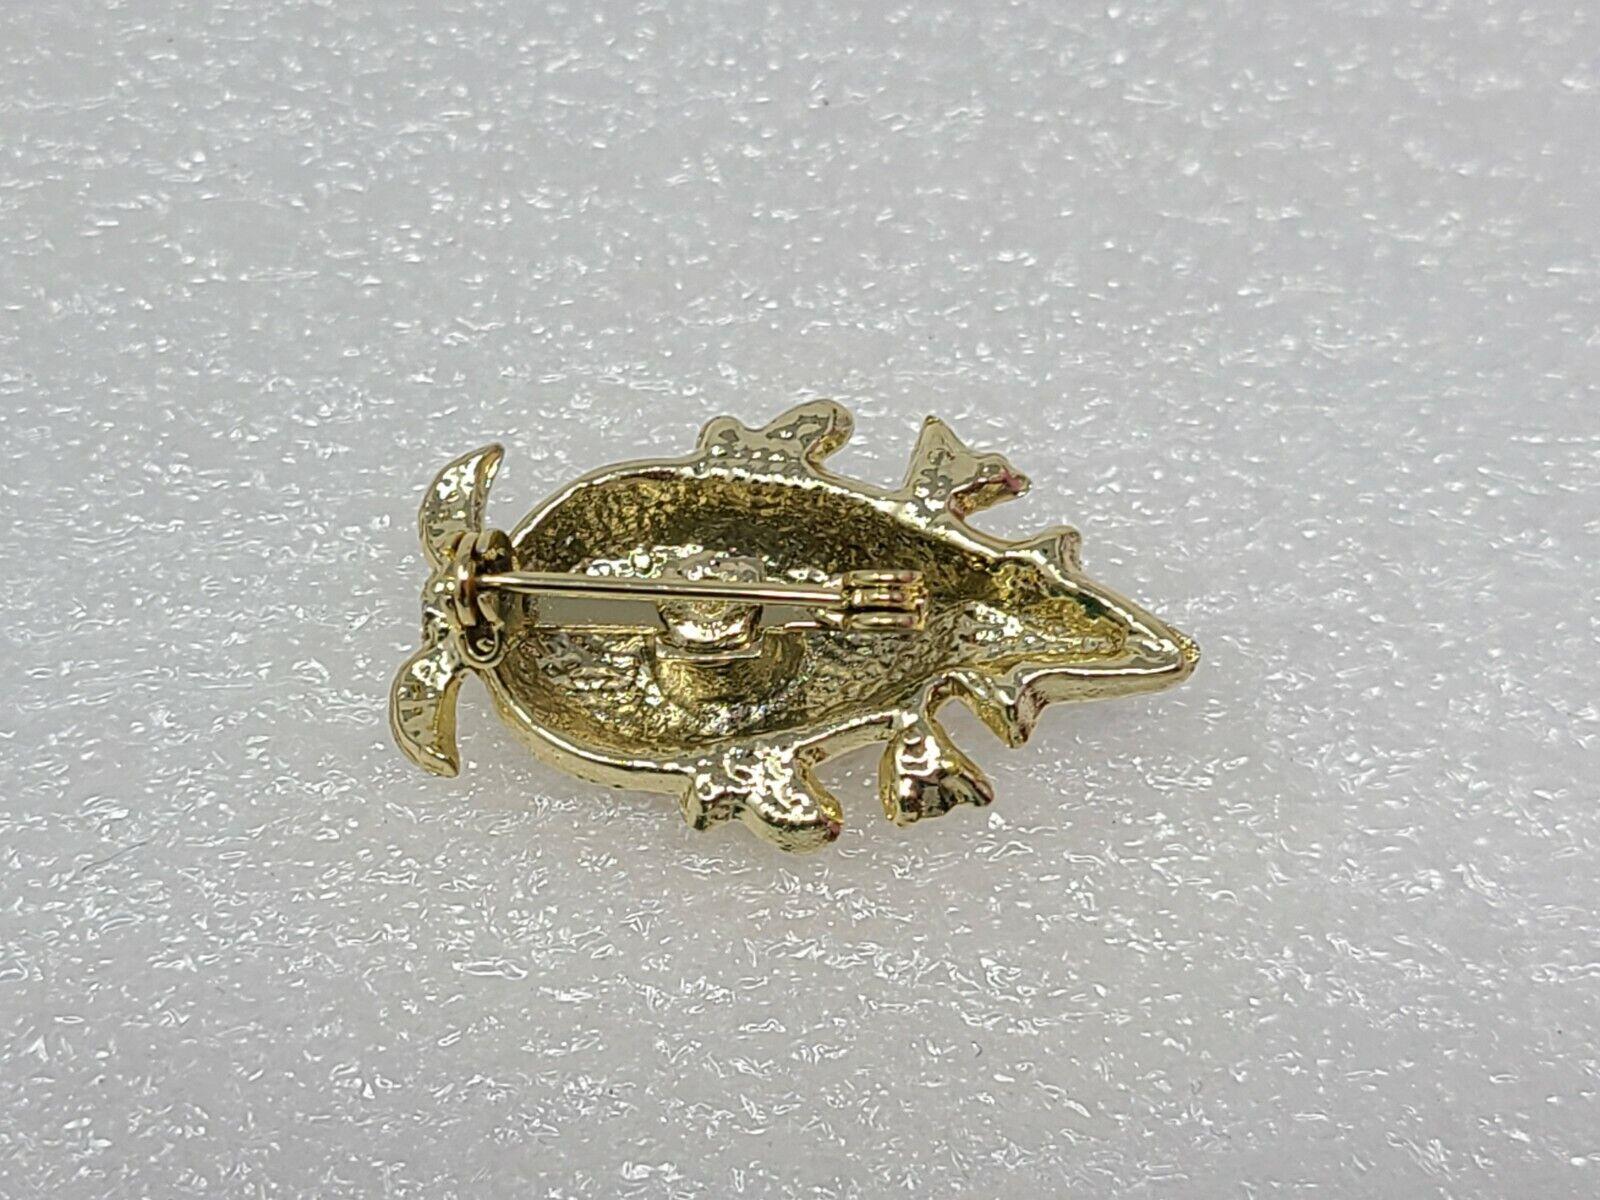 Vintage Novelty Lapel Pin Brooch Gold Tone - image 2